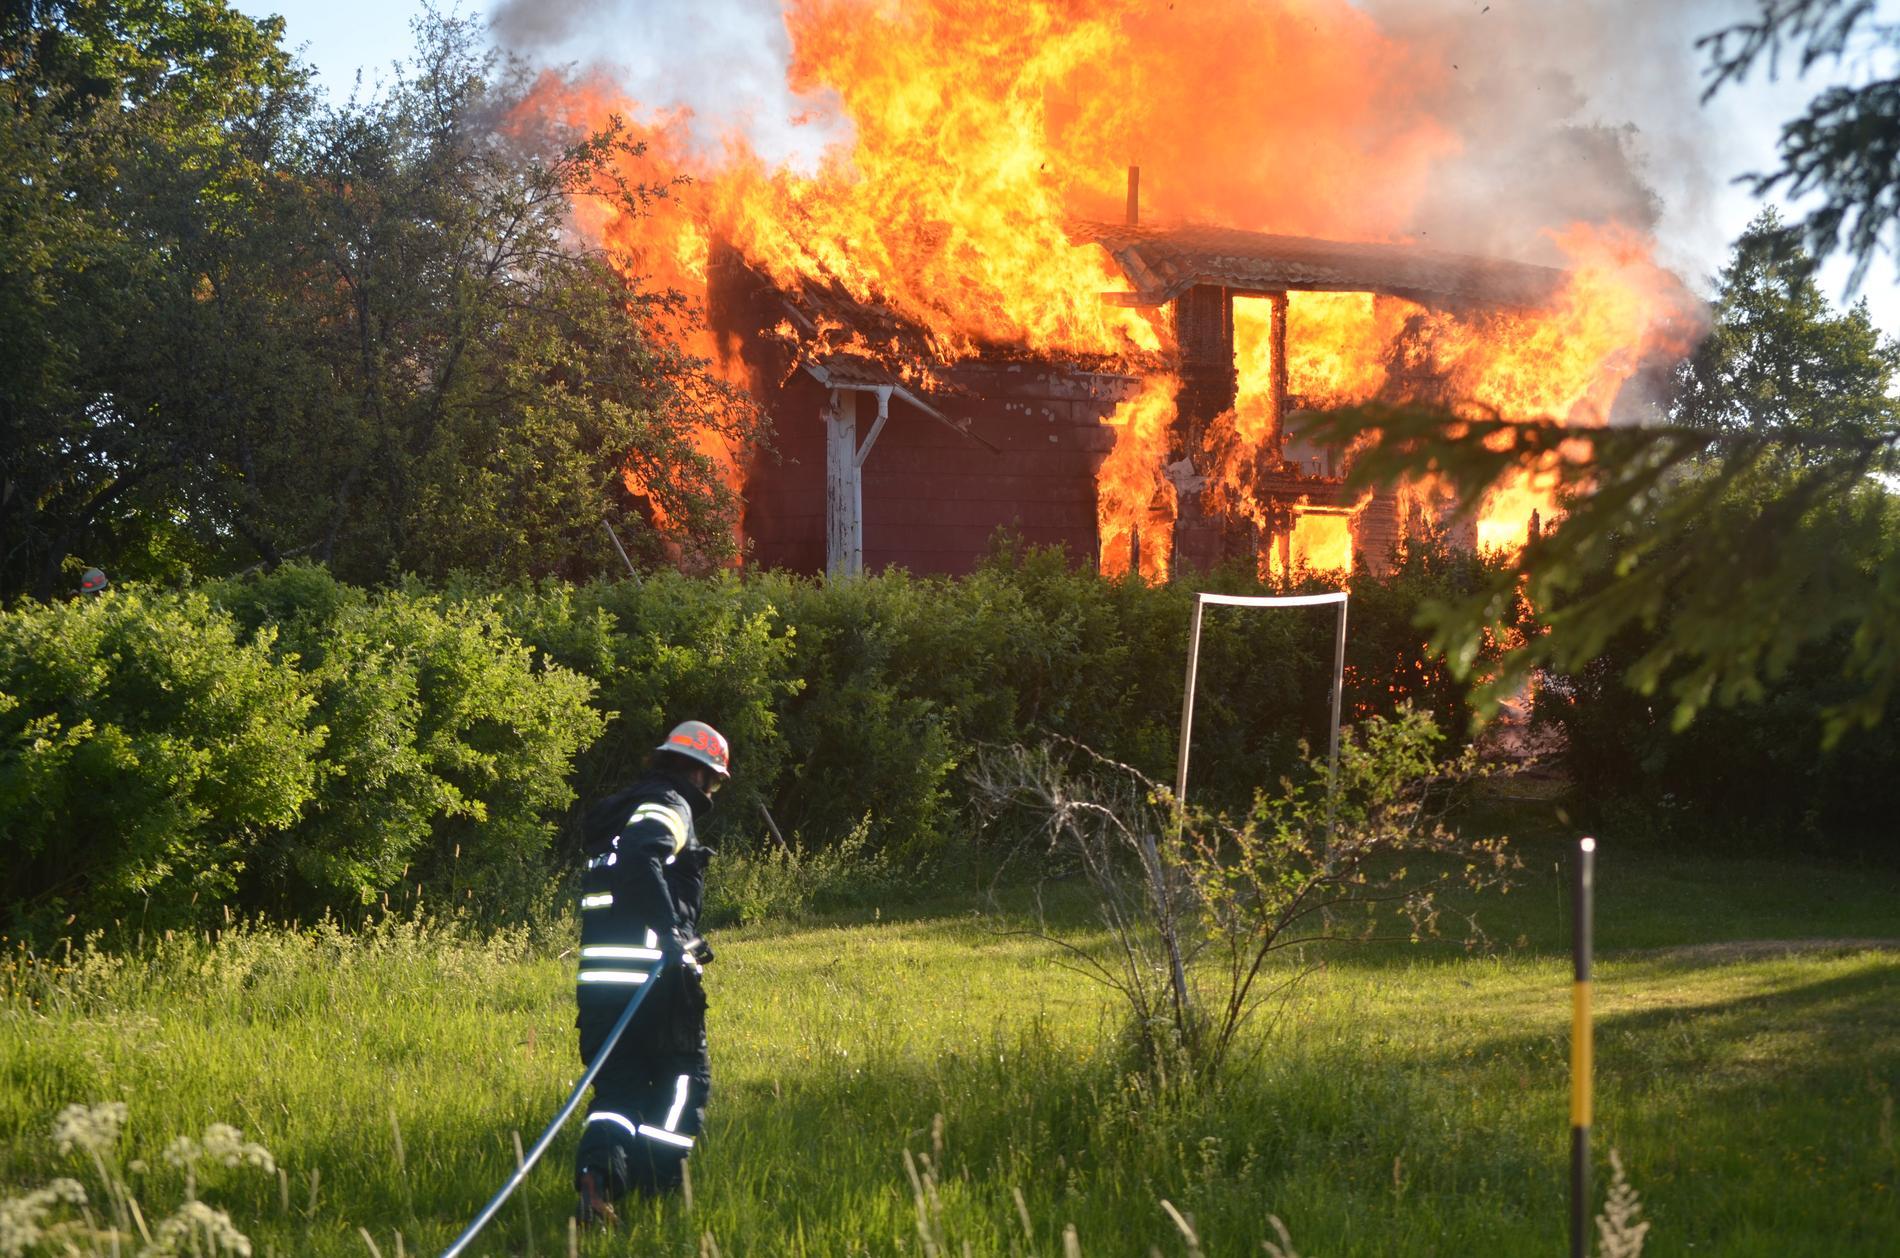 Ett hus har brunnit ned i Avesta.